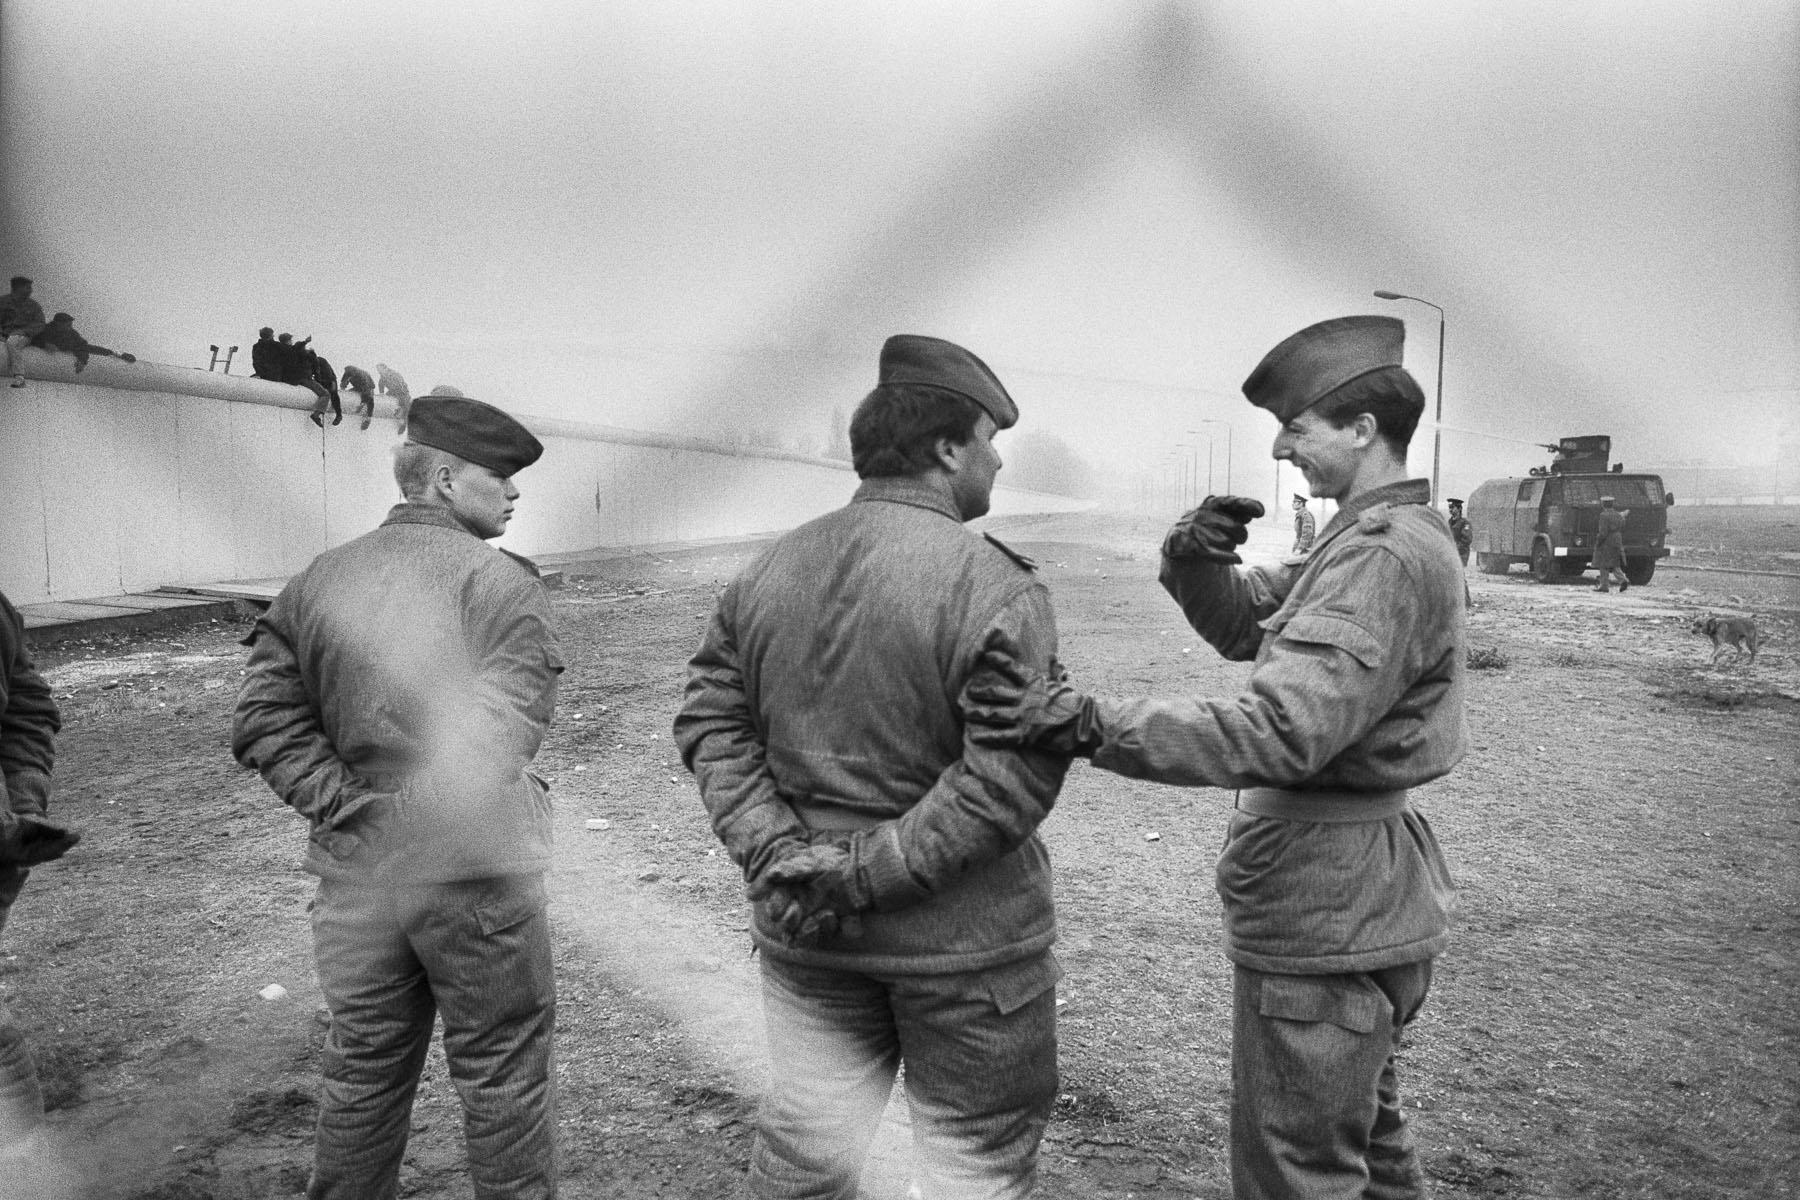 East German soldiers next to Potzdamer Platz on November 11, 1989